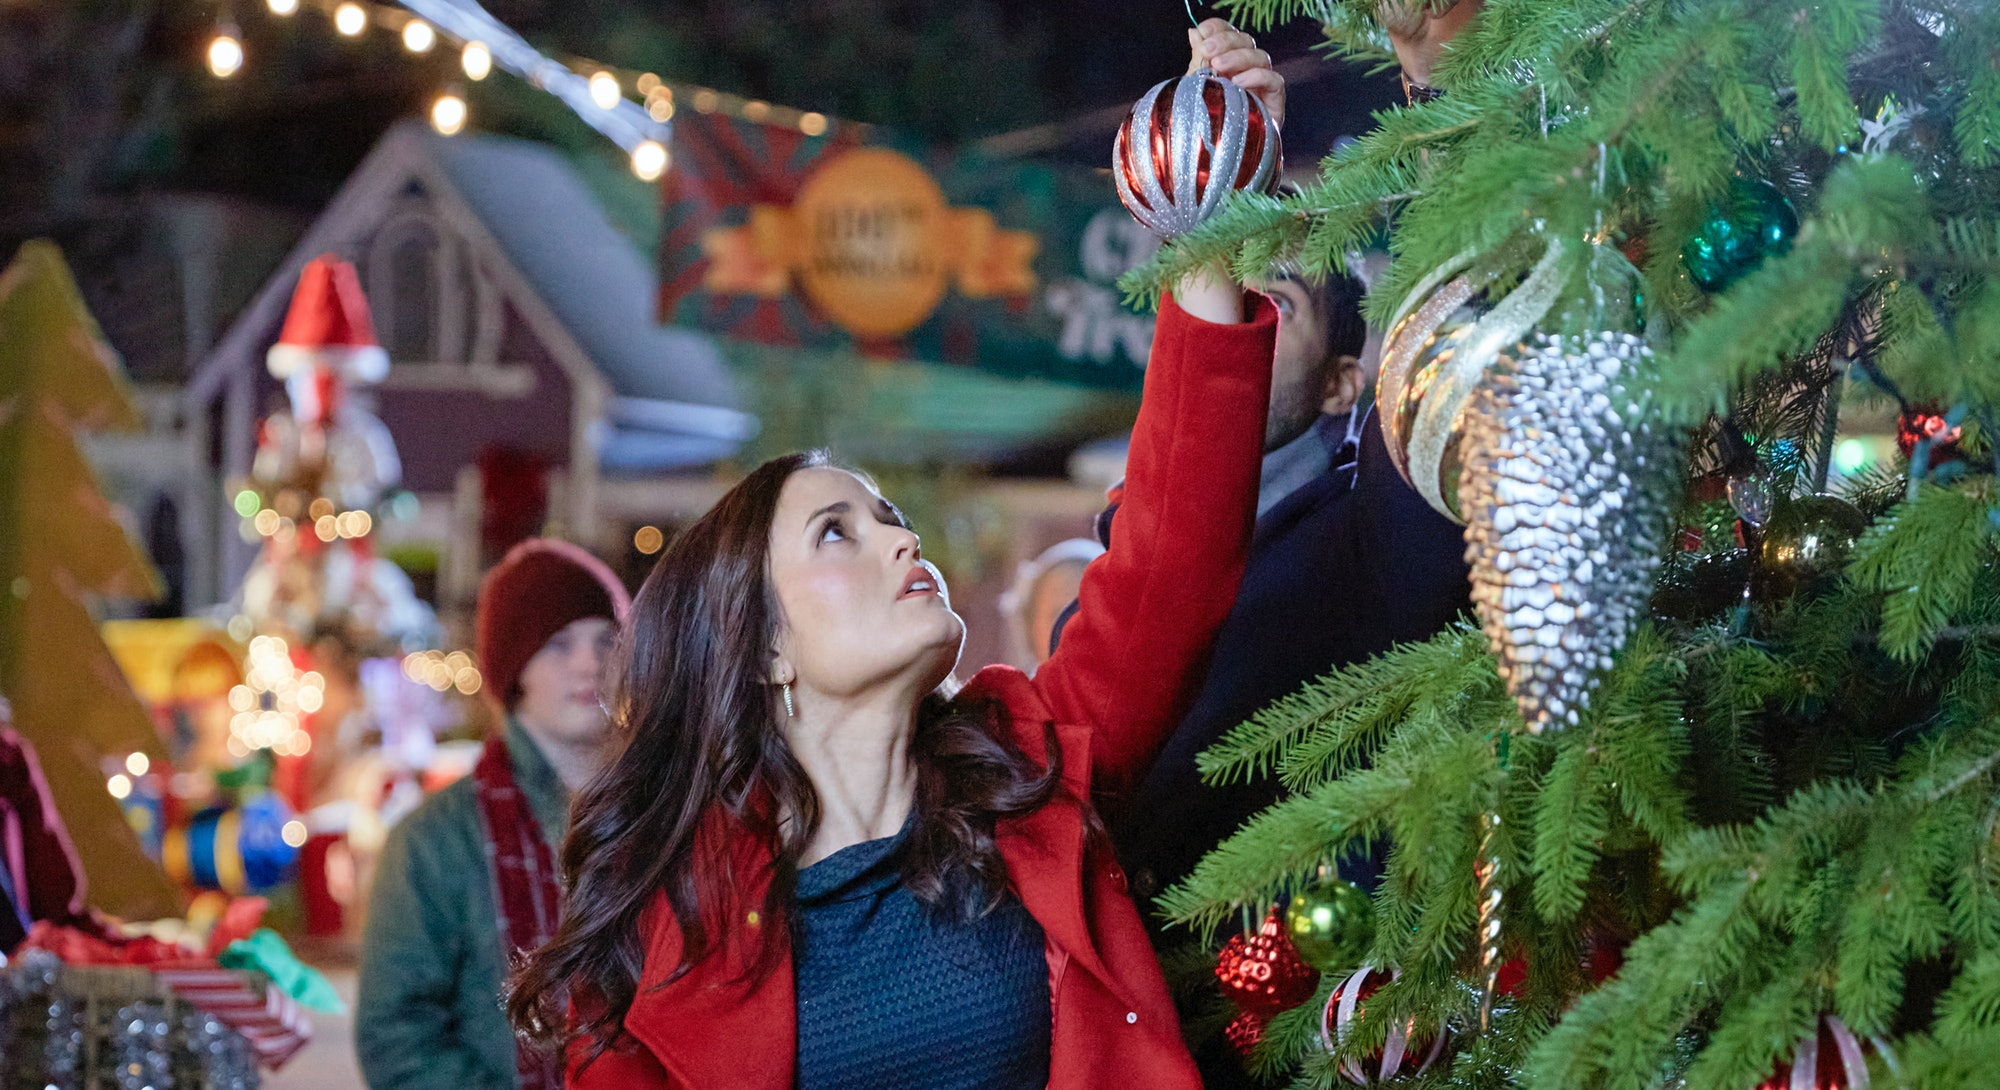 The 2021 Hallmark Christmas movie lineup begins in October.